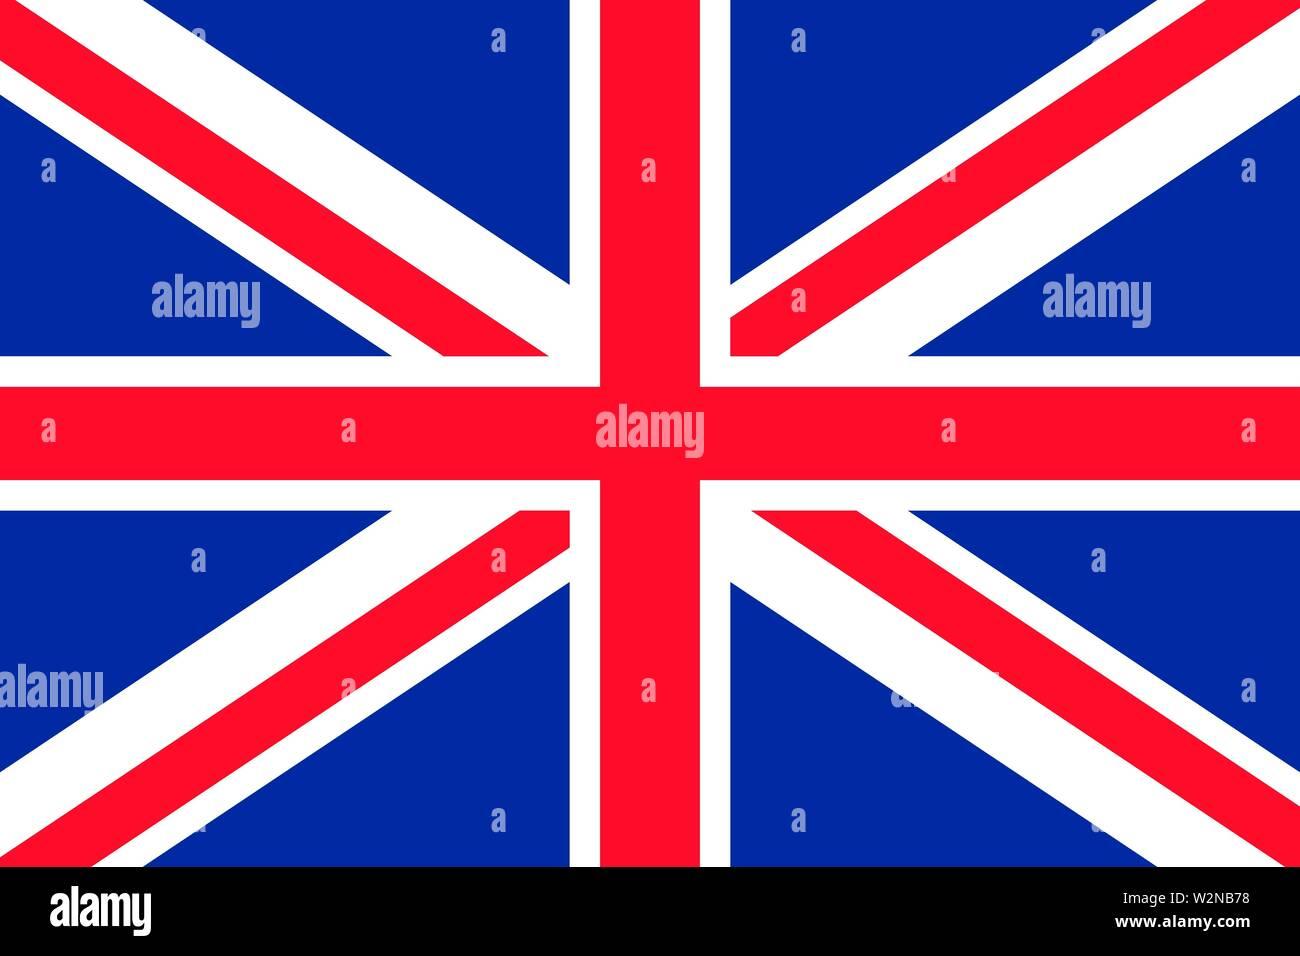 United kingdom flag background. Vector eps10 illustration - Stock Image